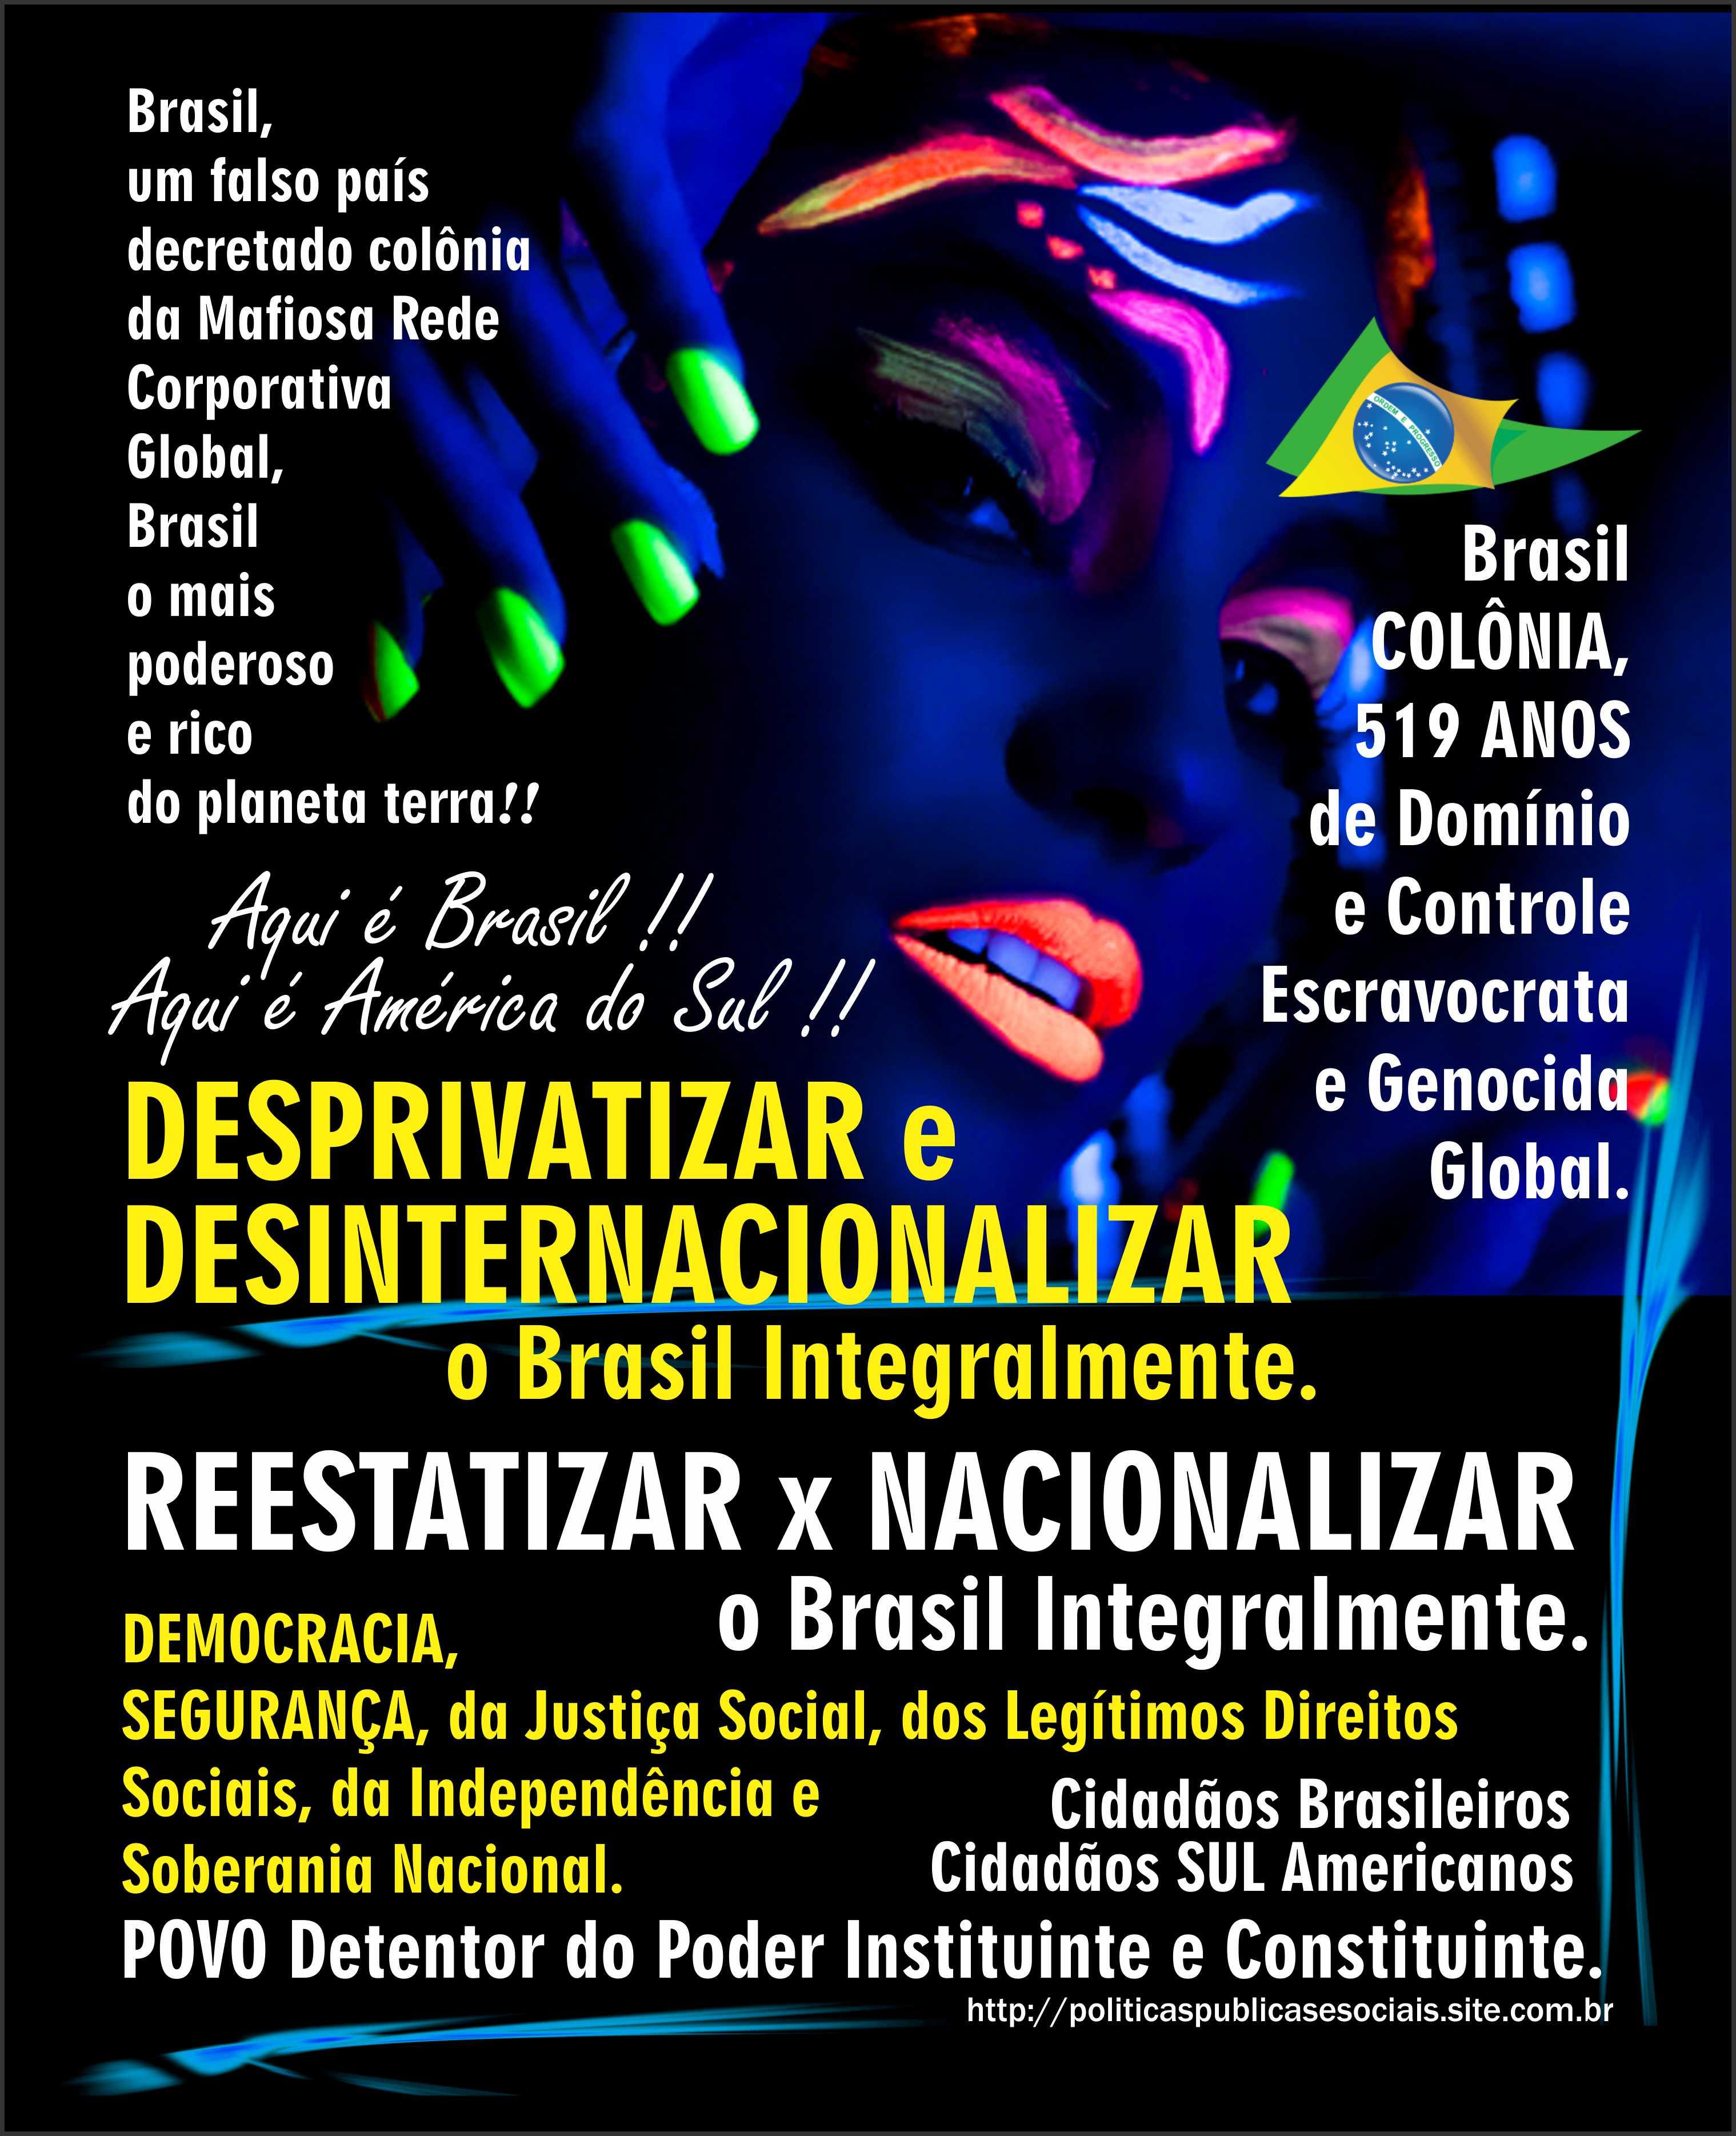 Desprivatizar Desinternacionalizar Reestatizar Nacionalizar